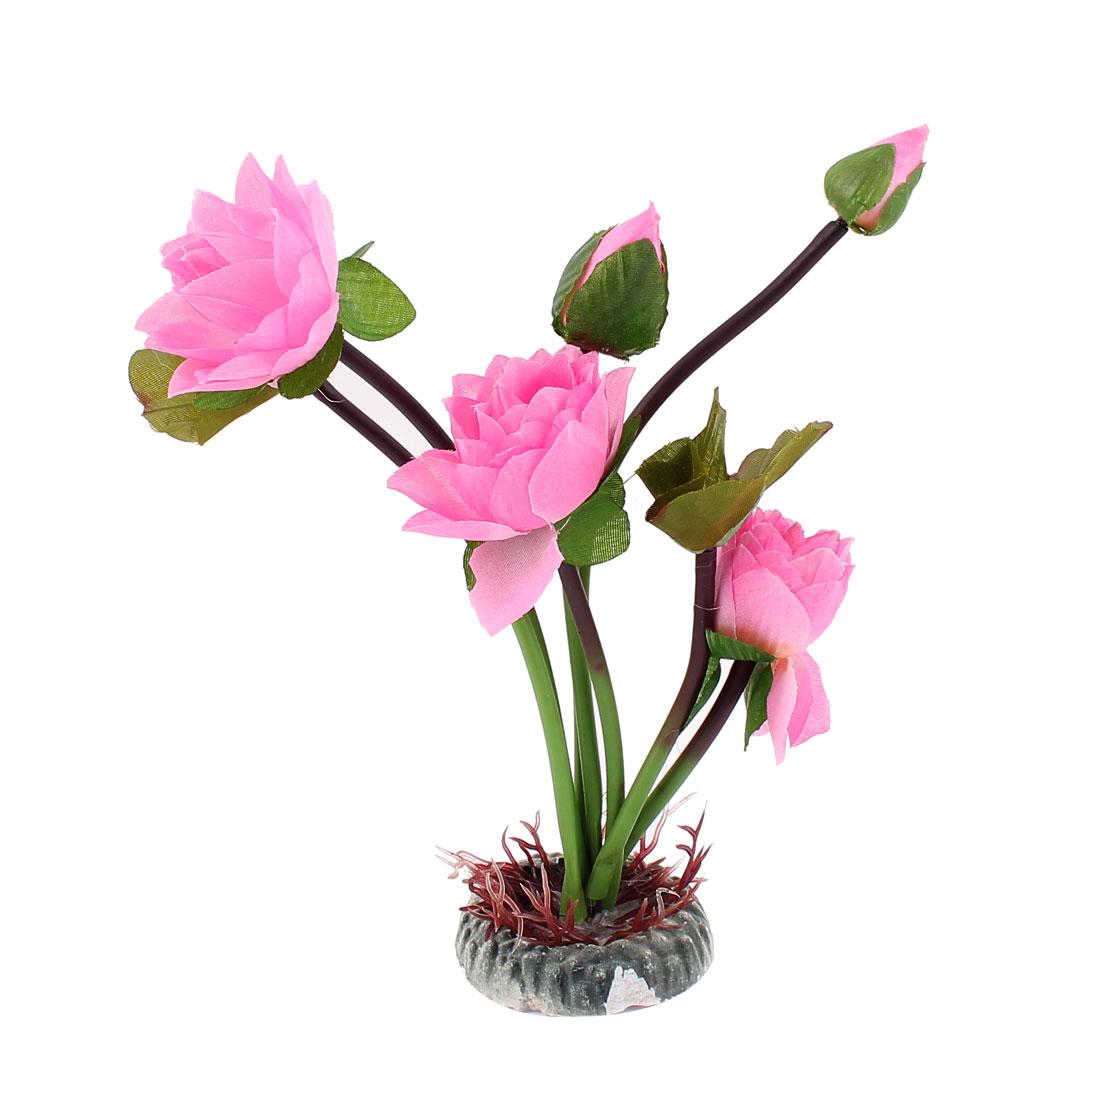 Aquarium Fish Tank Lotus Flower Decoration Ornaments Pink